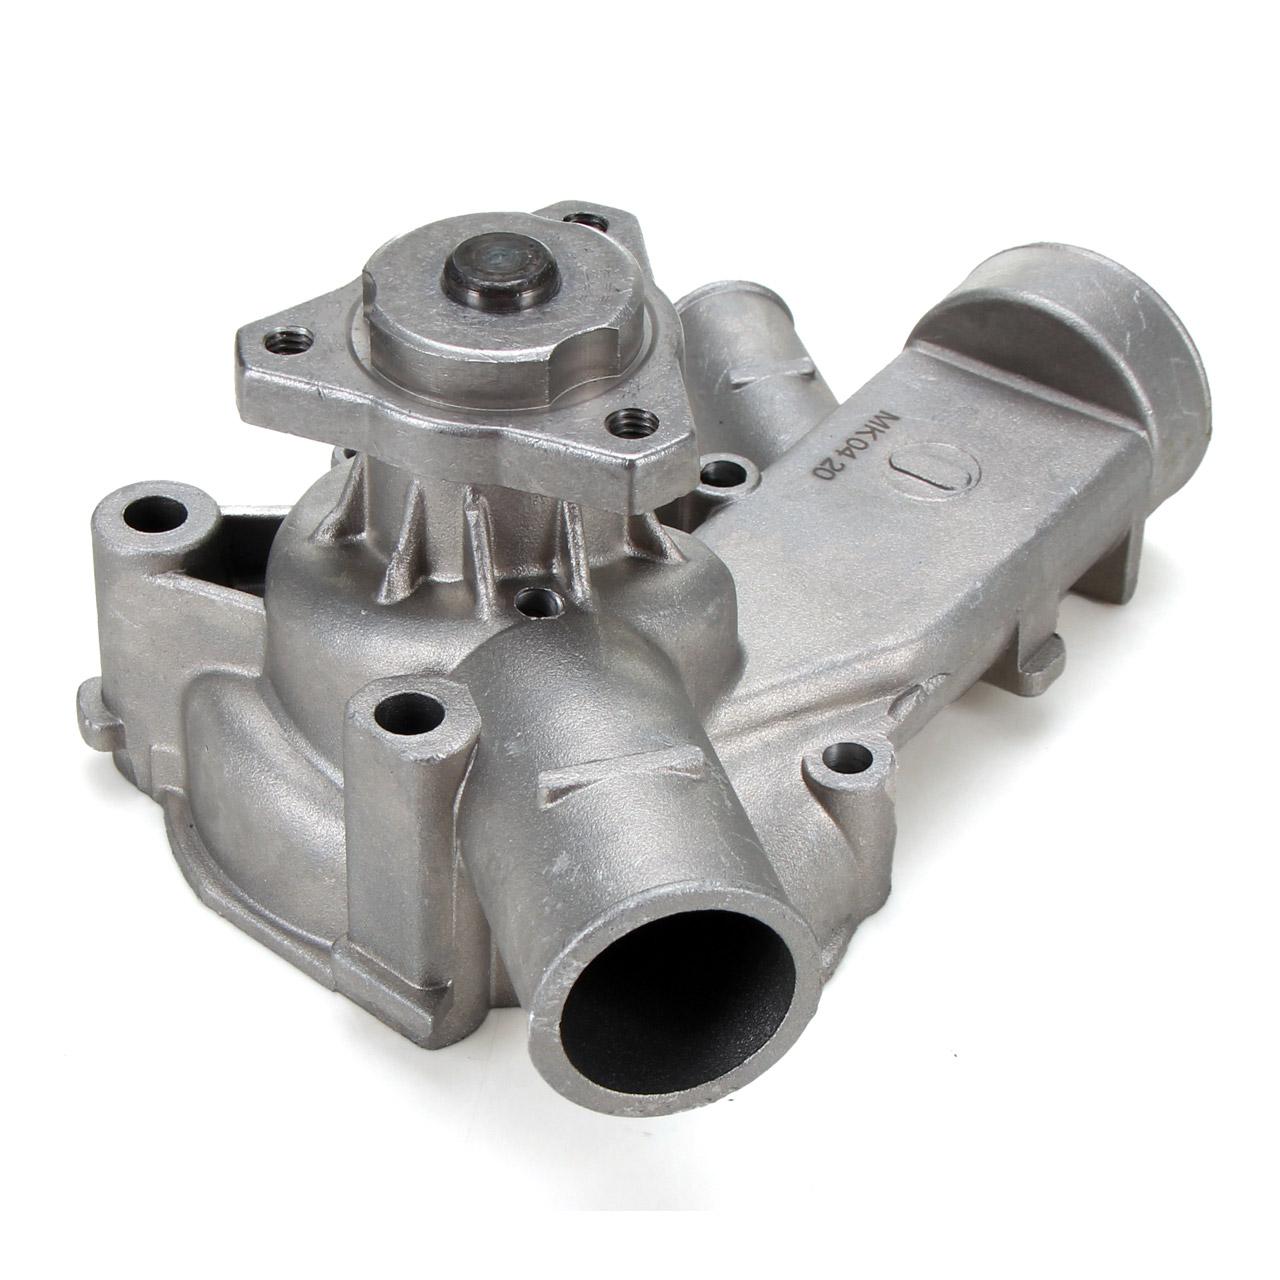 Saleri SIL Wasserpumpe PORSCHE 924 2.0 / Turbo / Carrera GT 060121012